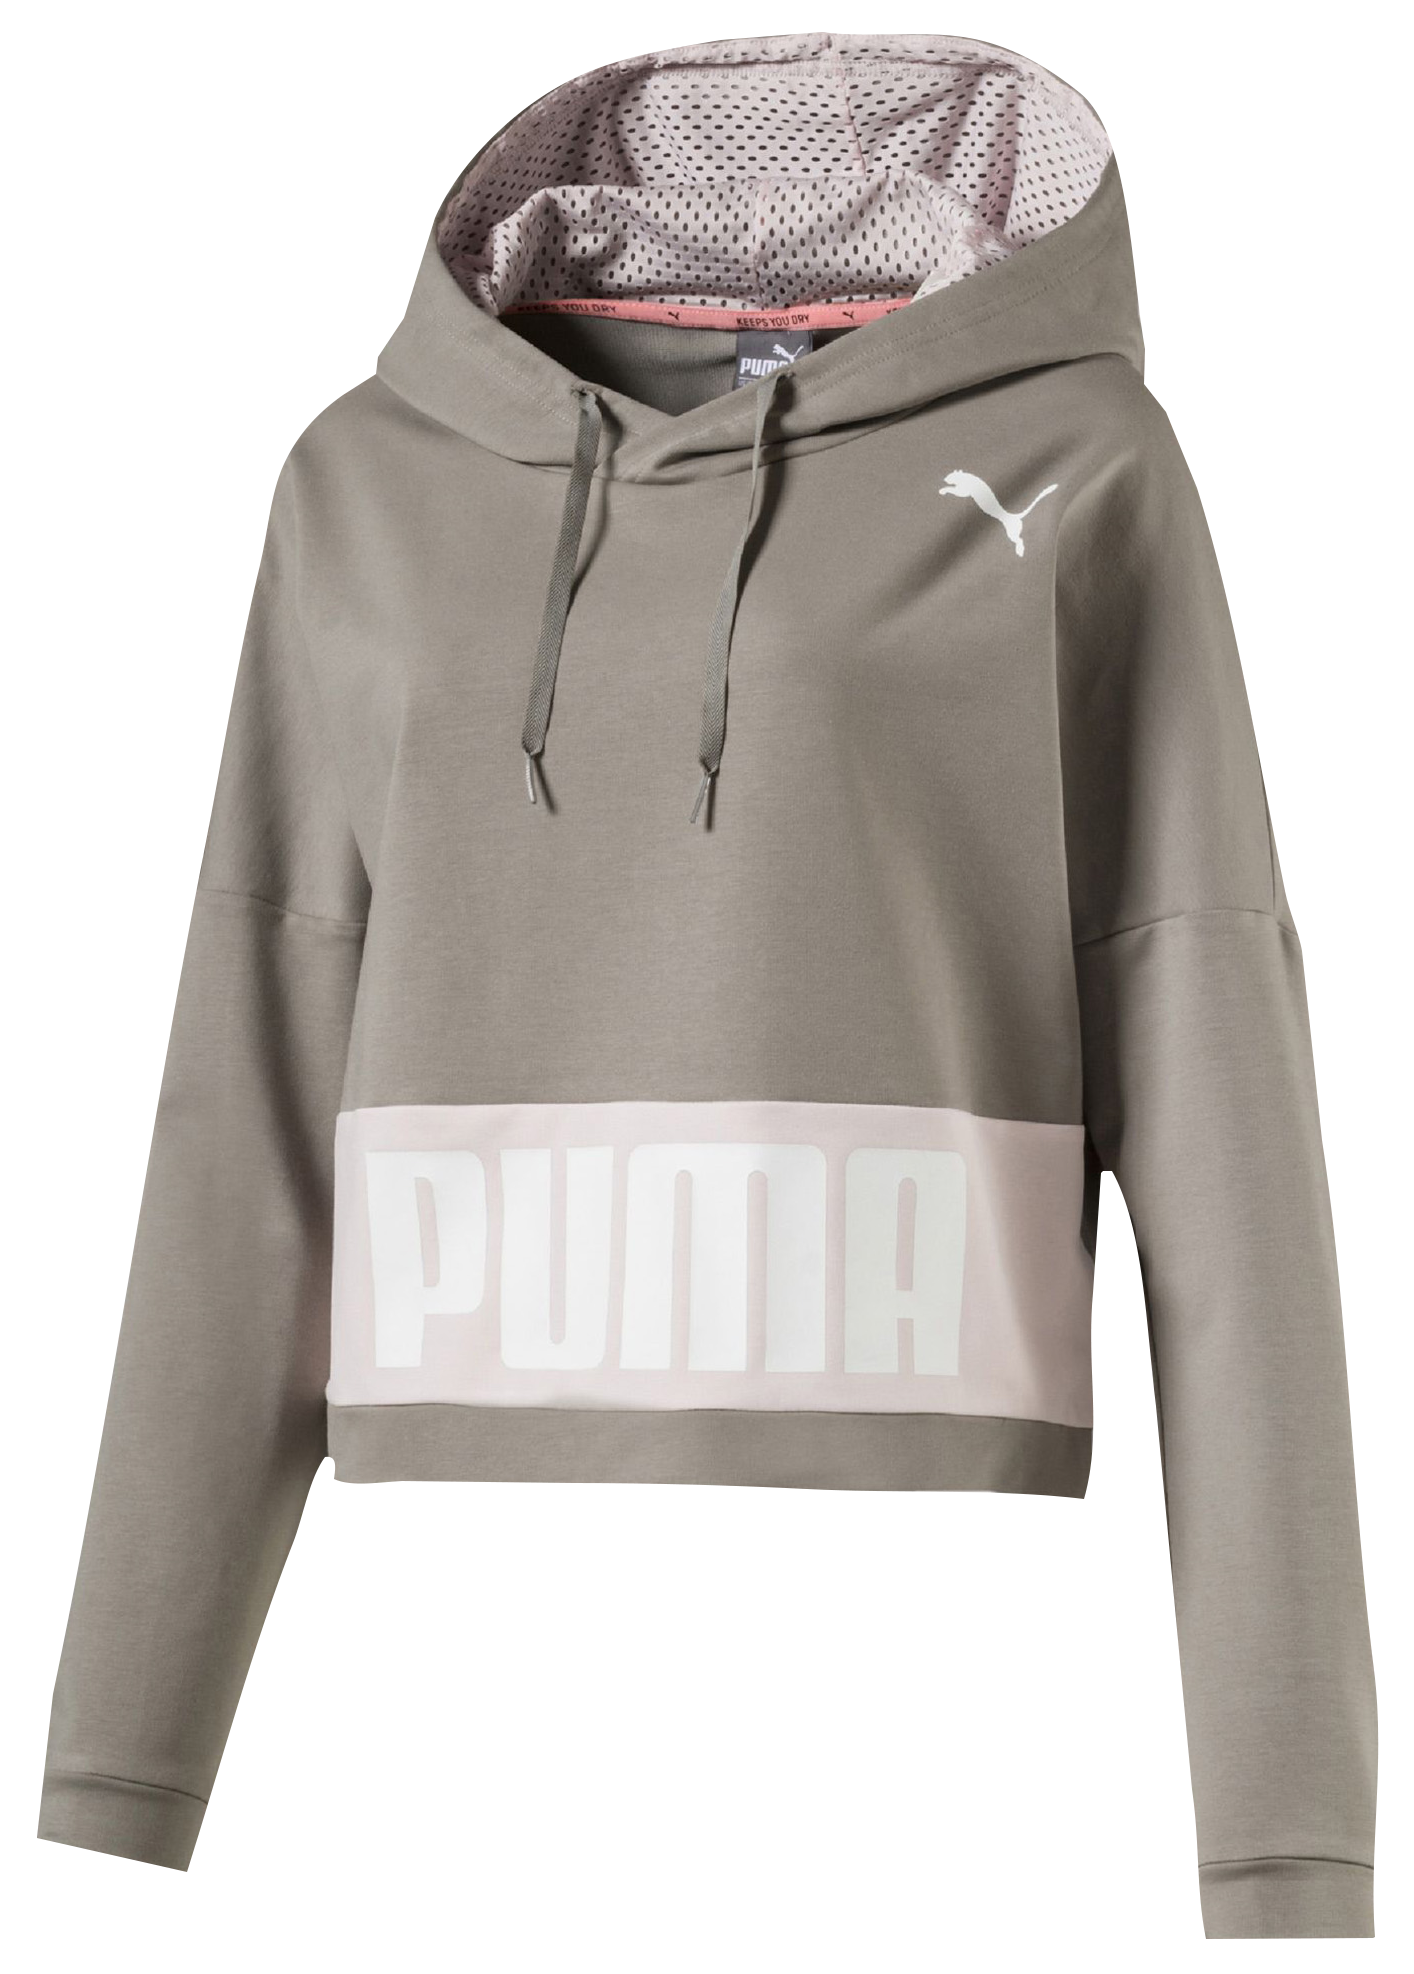 PUMA Urban Sports Cropped Hoodie - Women\u0027s